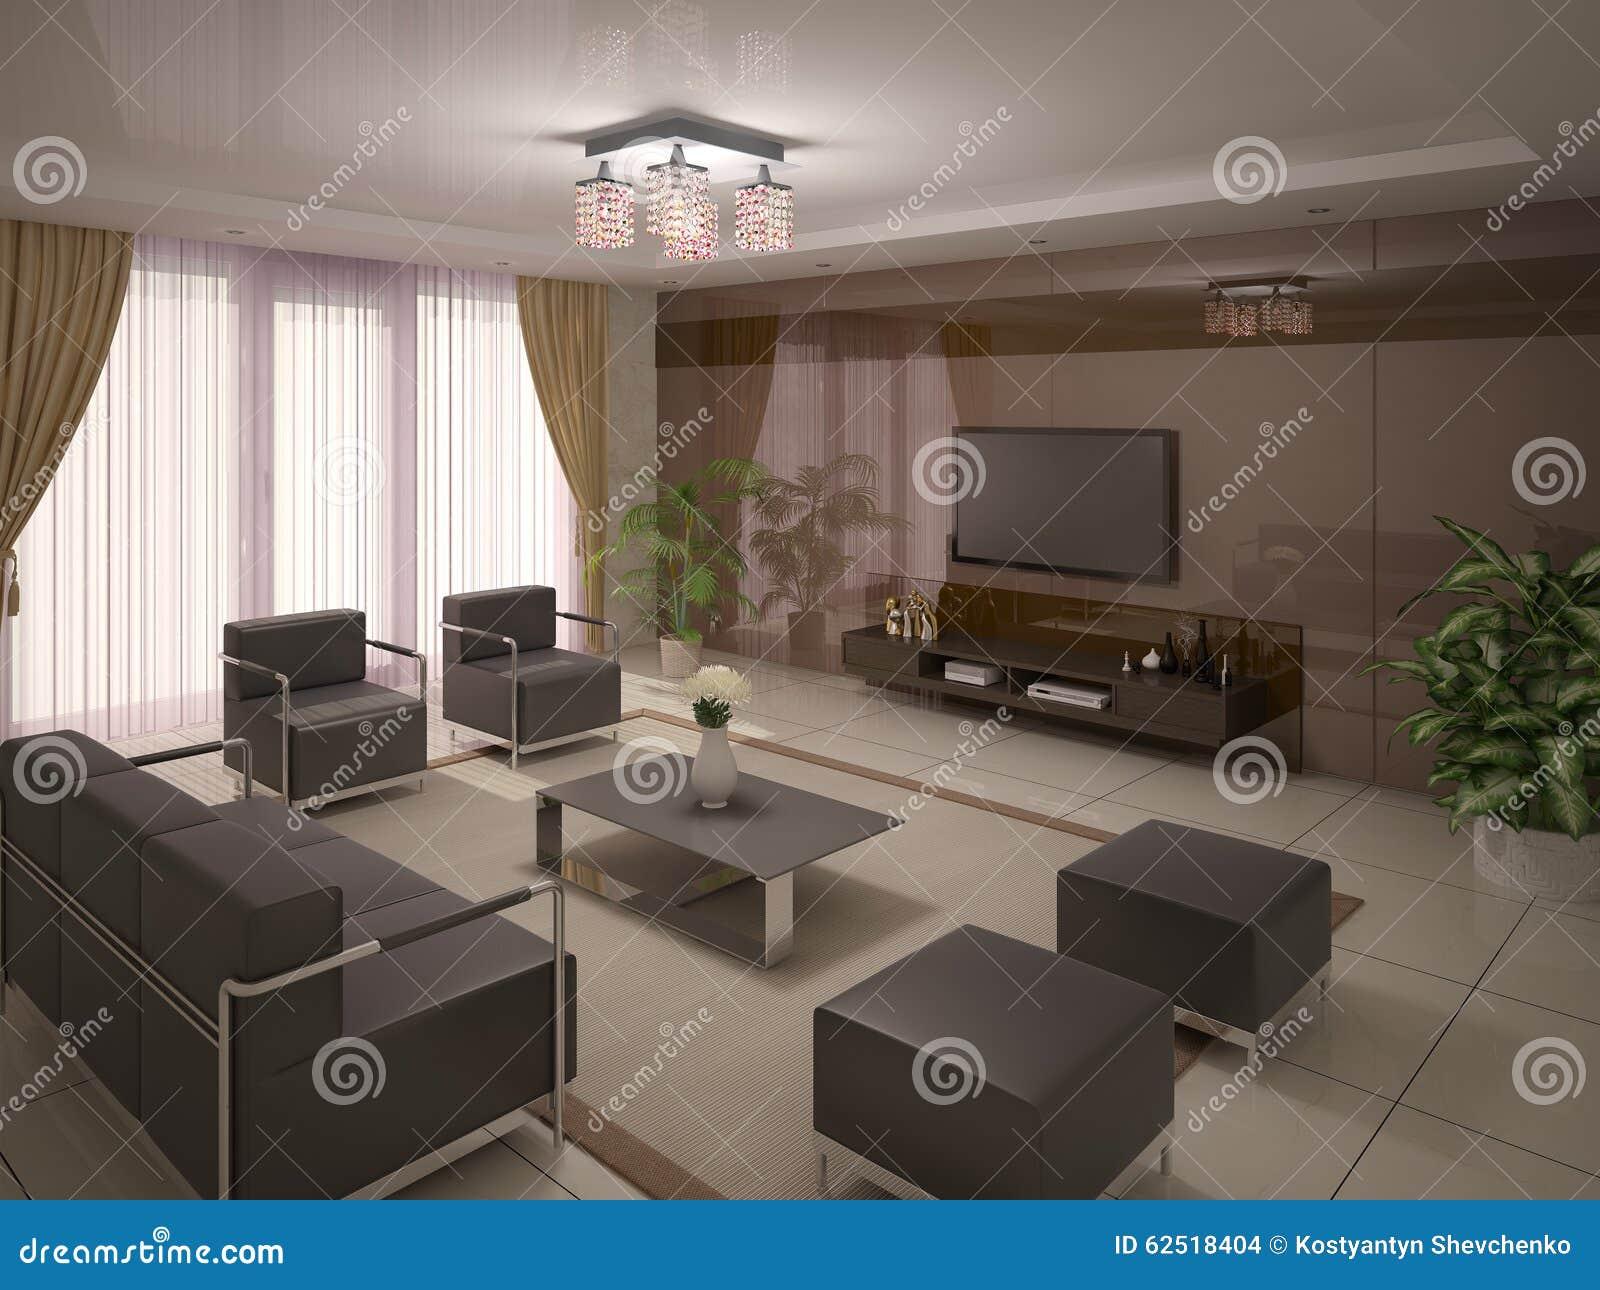 Comfortable Living Room Stock Illustration Image 62518404